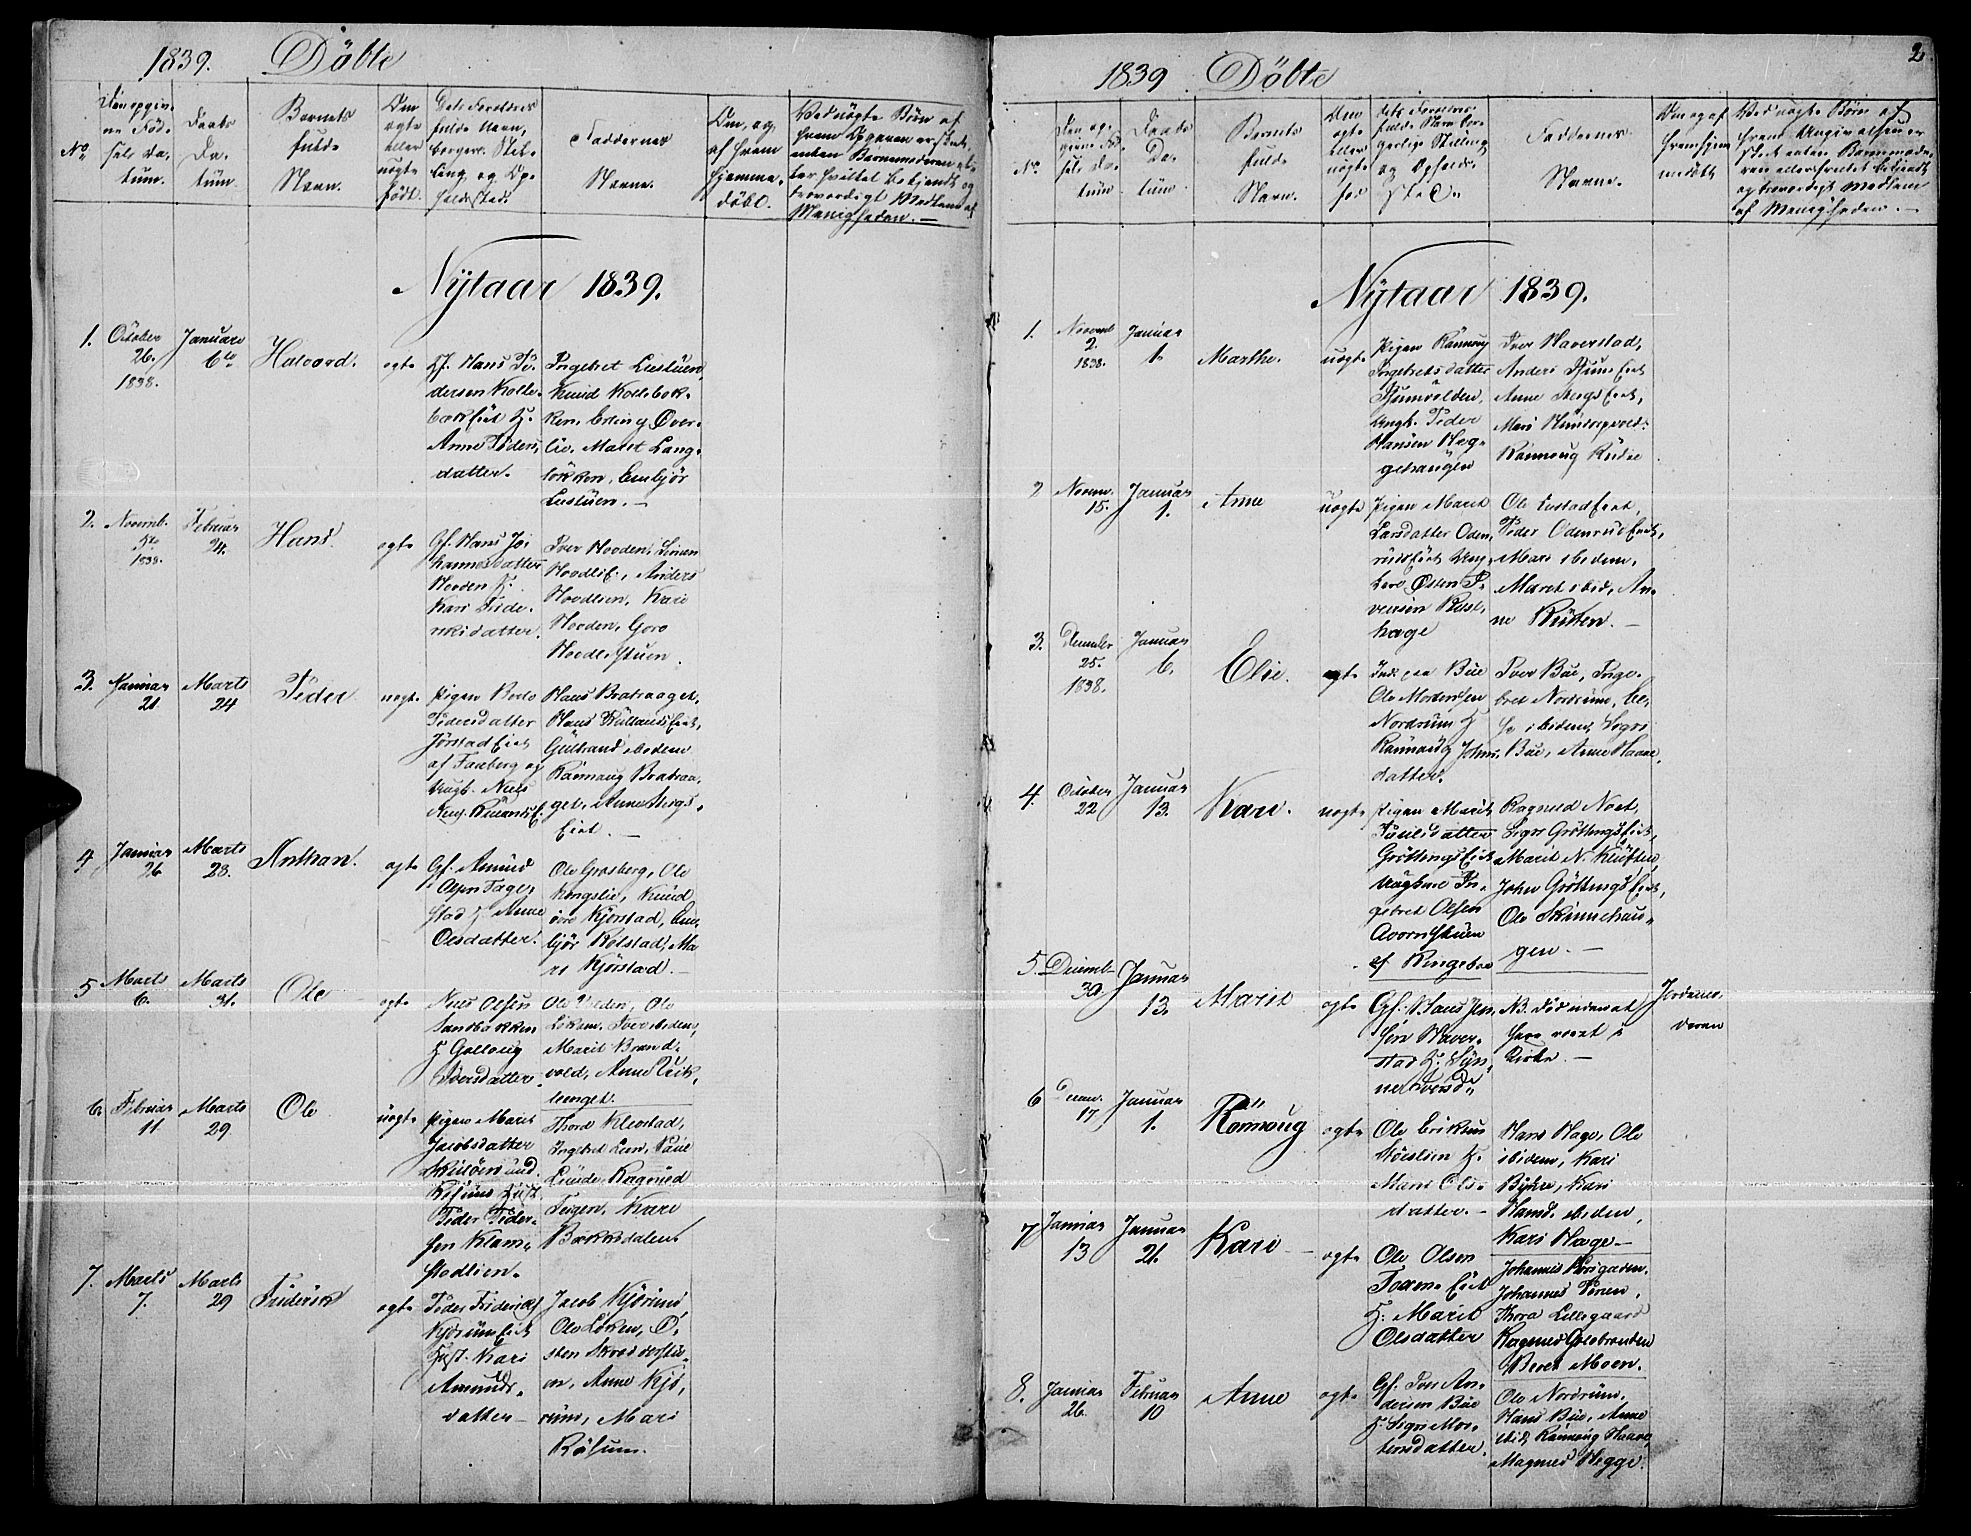 SAH, Fron prestekontor, H/Ha/Haa/L0004: Ministerialbok nr. 4, 1839-1848, s. 2